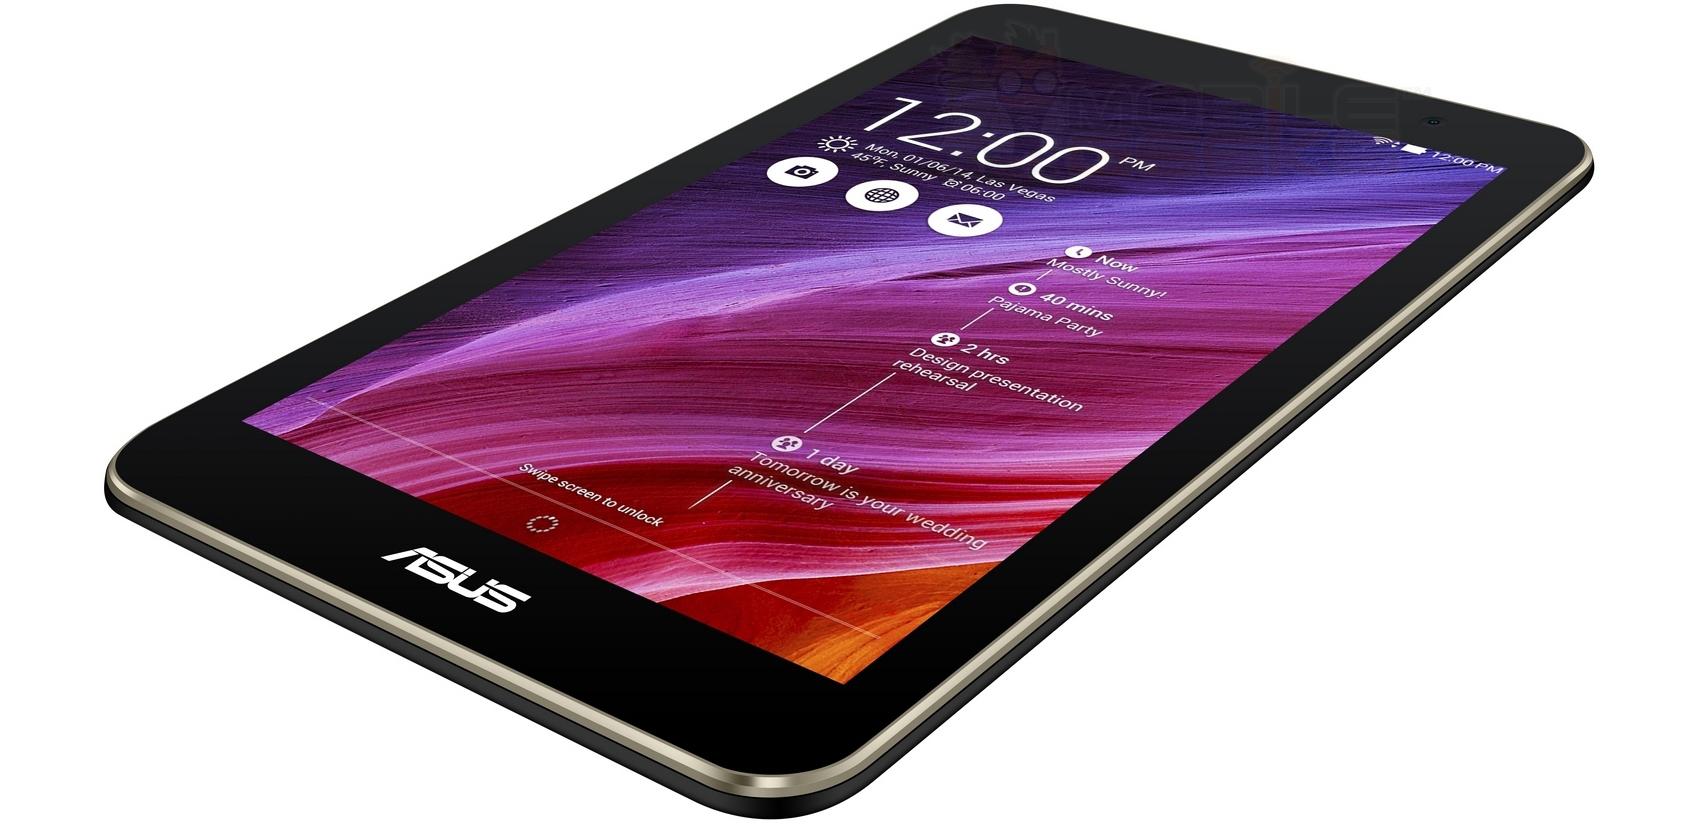 "ASUS MeMO Pad 7 ME176C: Alle Infos zum neuen 7-inch Android-Tablet mit Atom ""Bay Trail"" Quadcore"